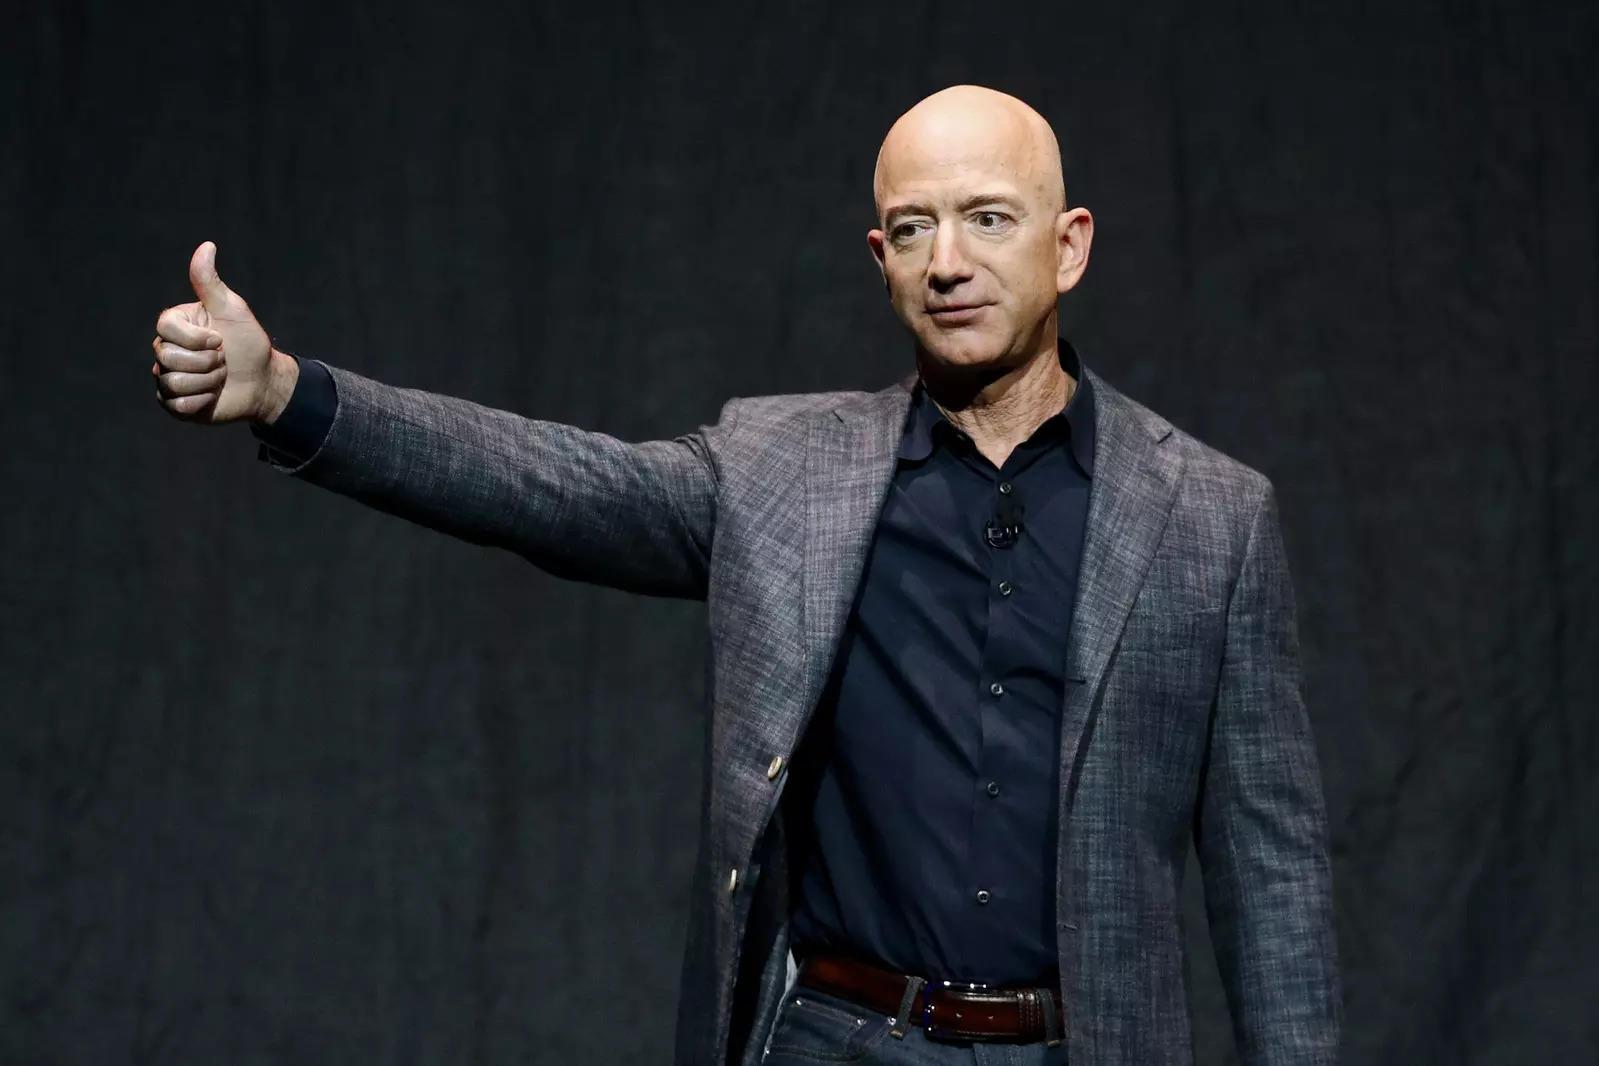 UK PM Boris Johnson To Challenge Jeff Bezos Over Amazon Tax Record: Report